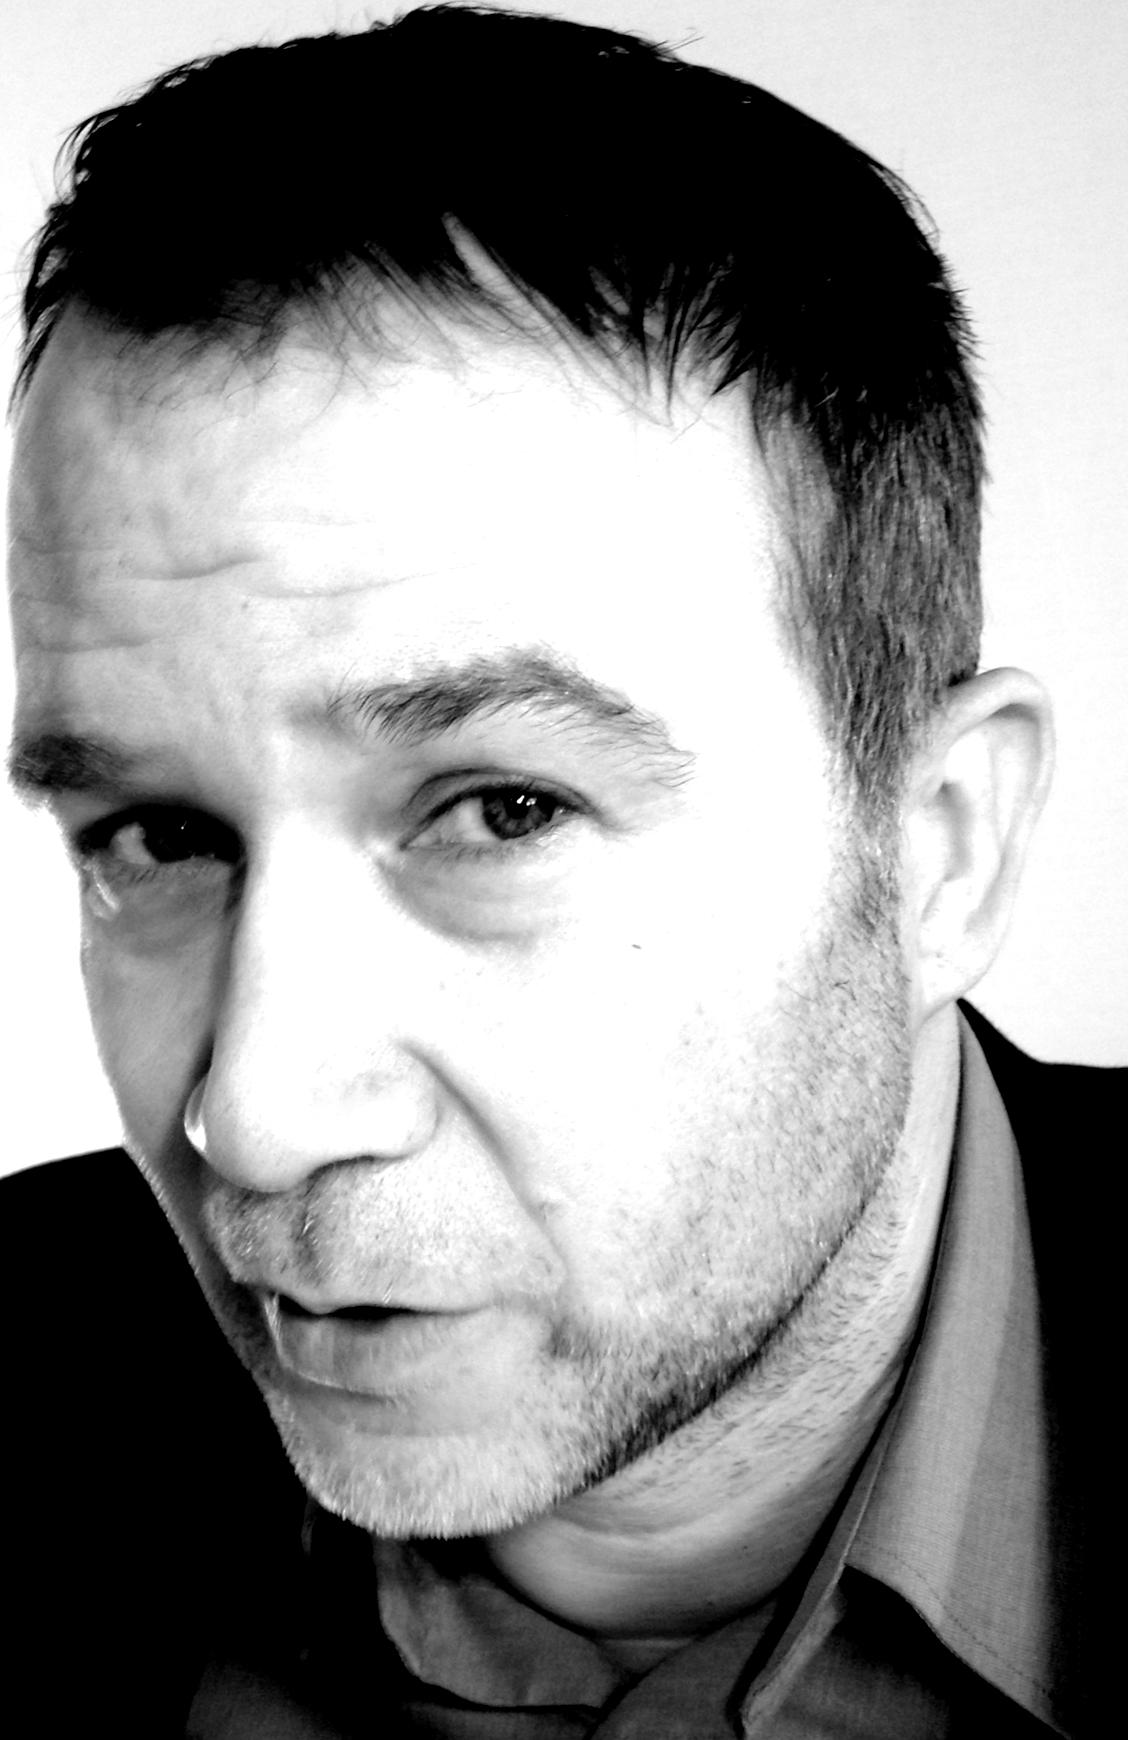 Gareth Somers